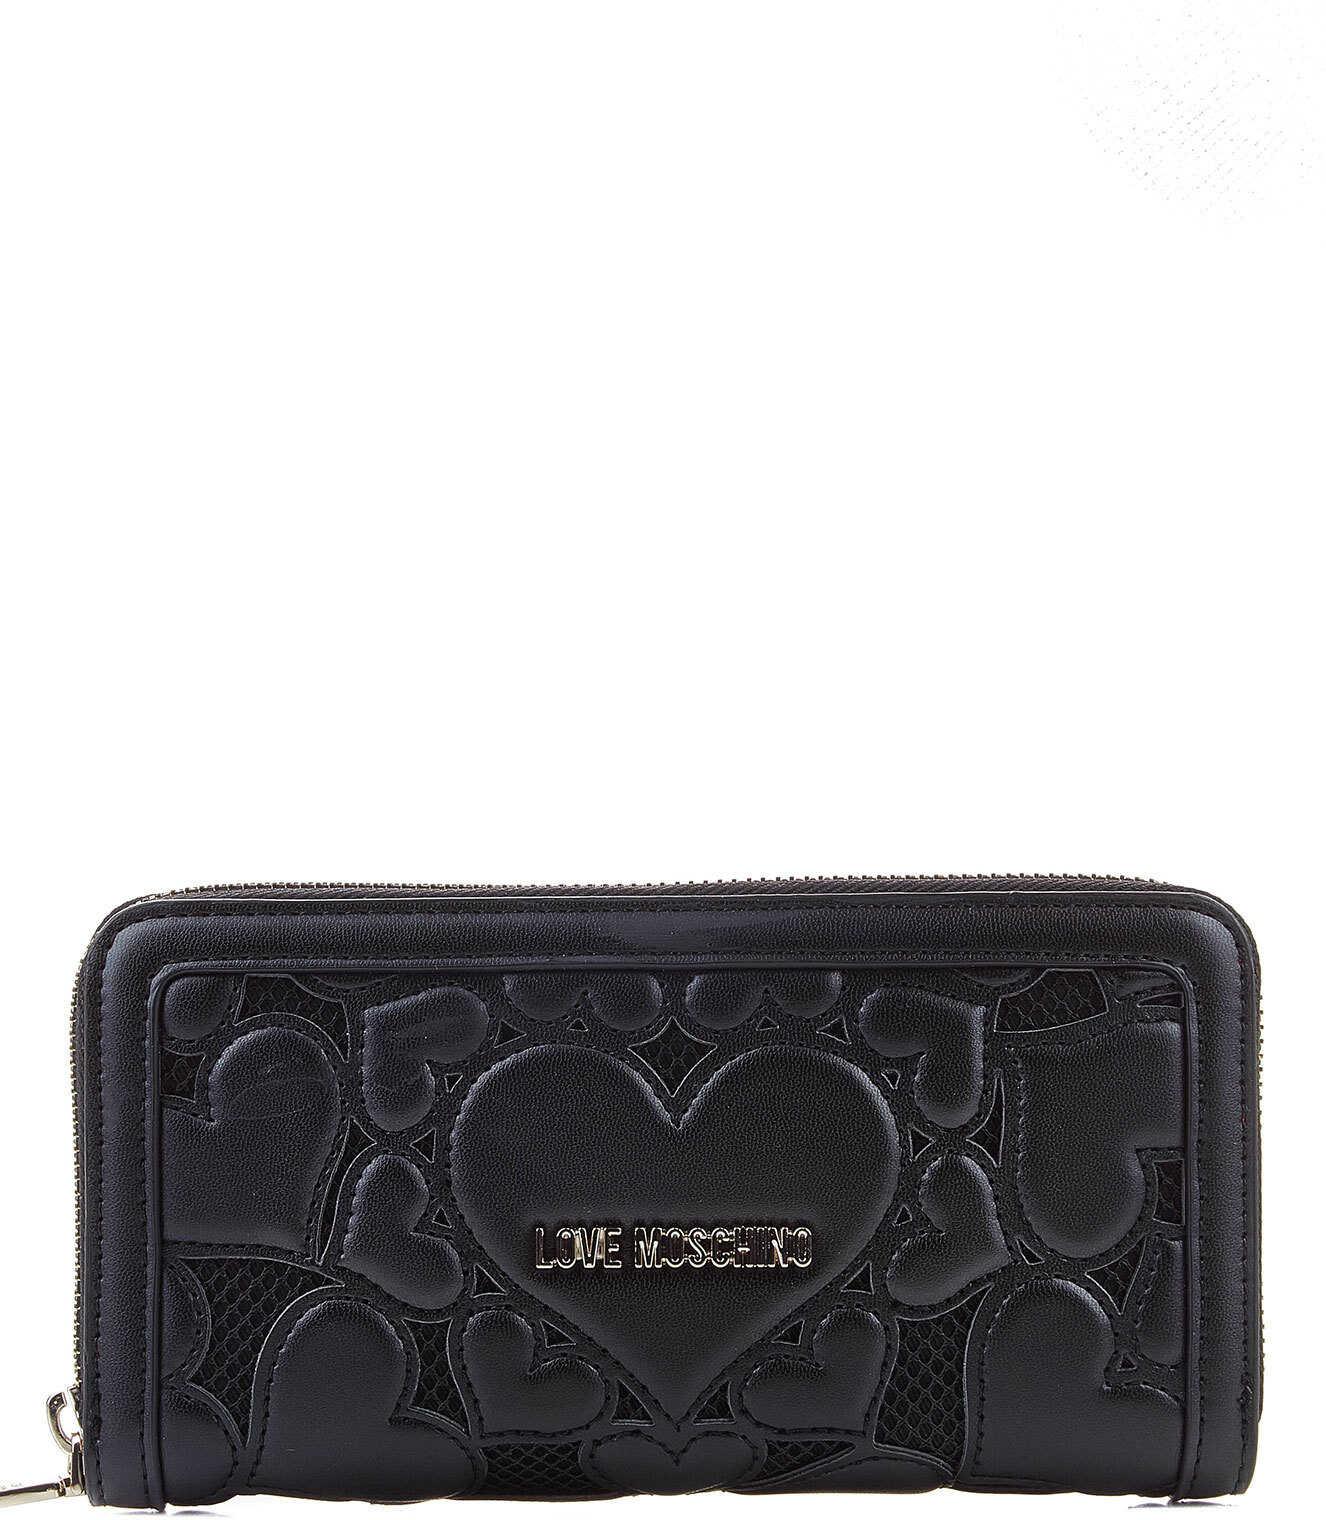 LOVE Moschino Portemonnaie Black